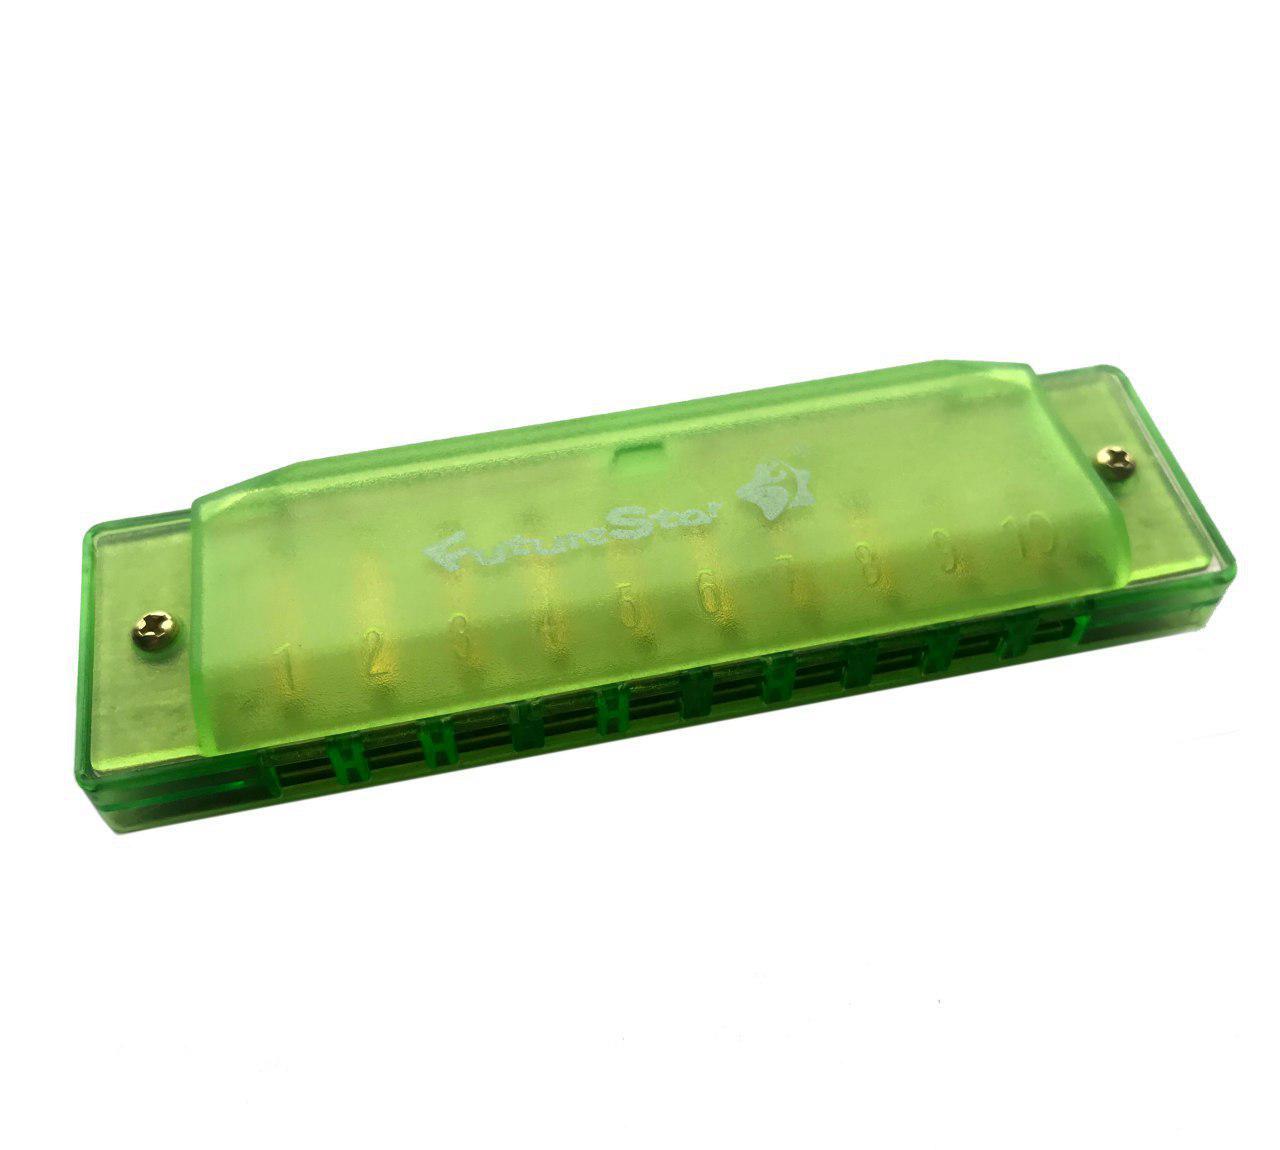 Губная гармошка Future Star SL-1017/GR MF00760, зеленый скейтборд пластиковый tempish buffy star цвет зеленый